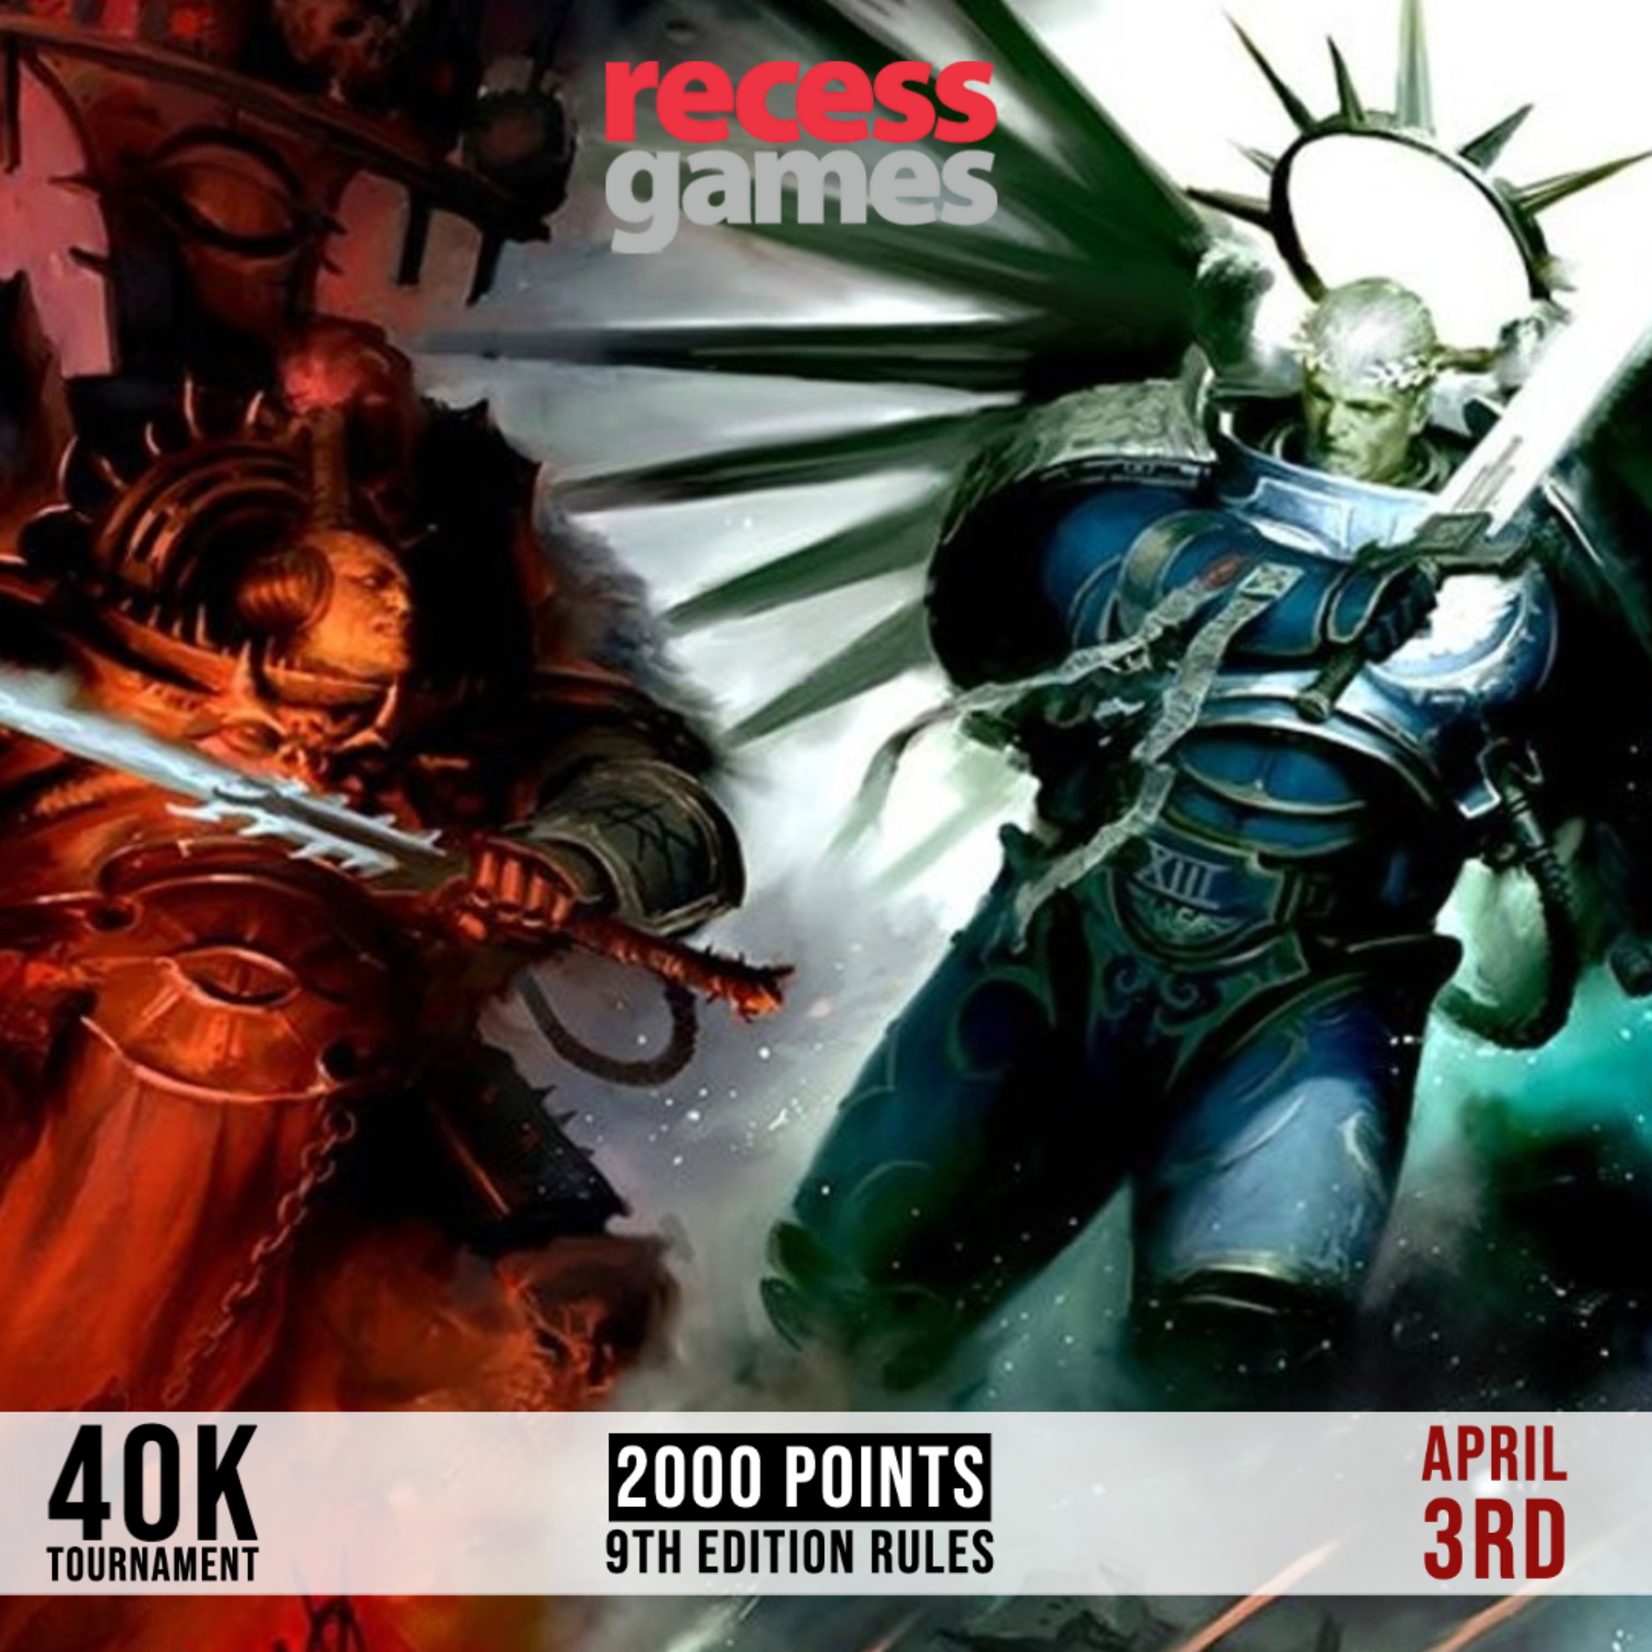 Recess 40k Tournament - April 3, 2021